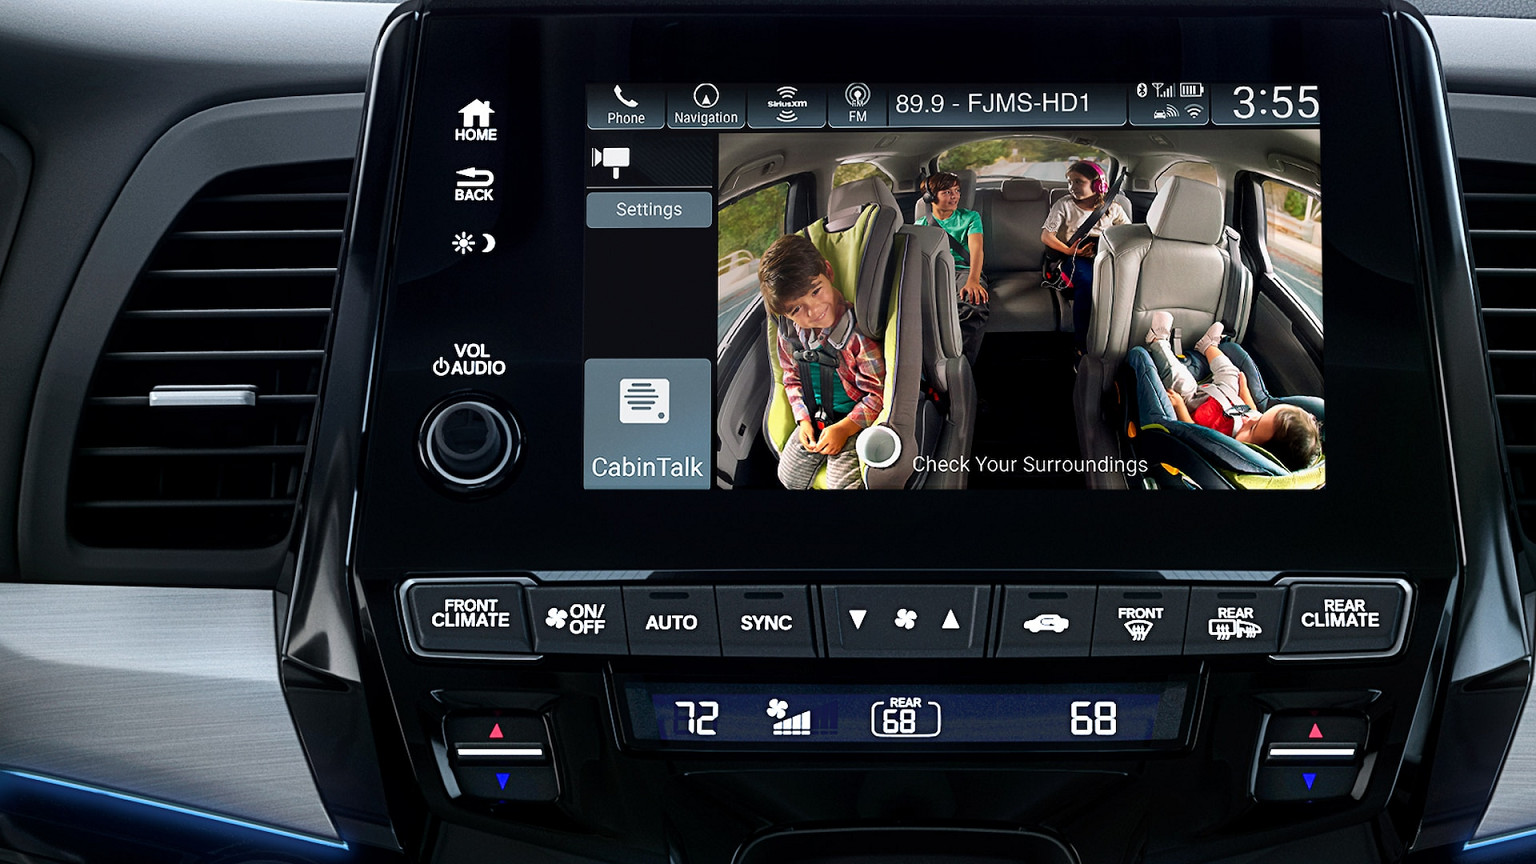 2020 Honda Odyssey With CabinWatch®